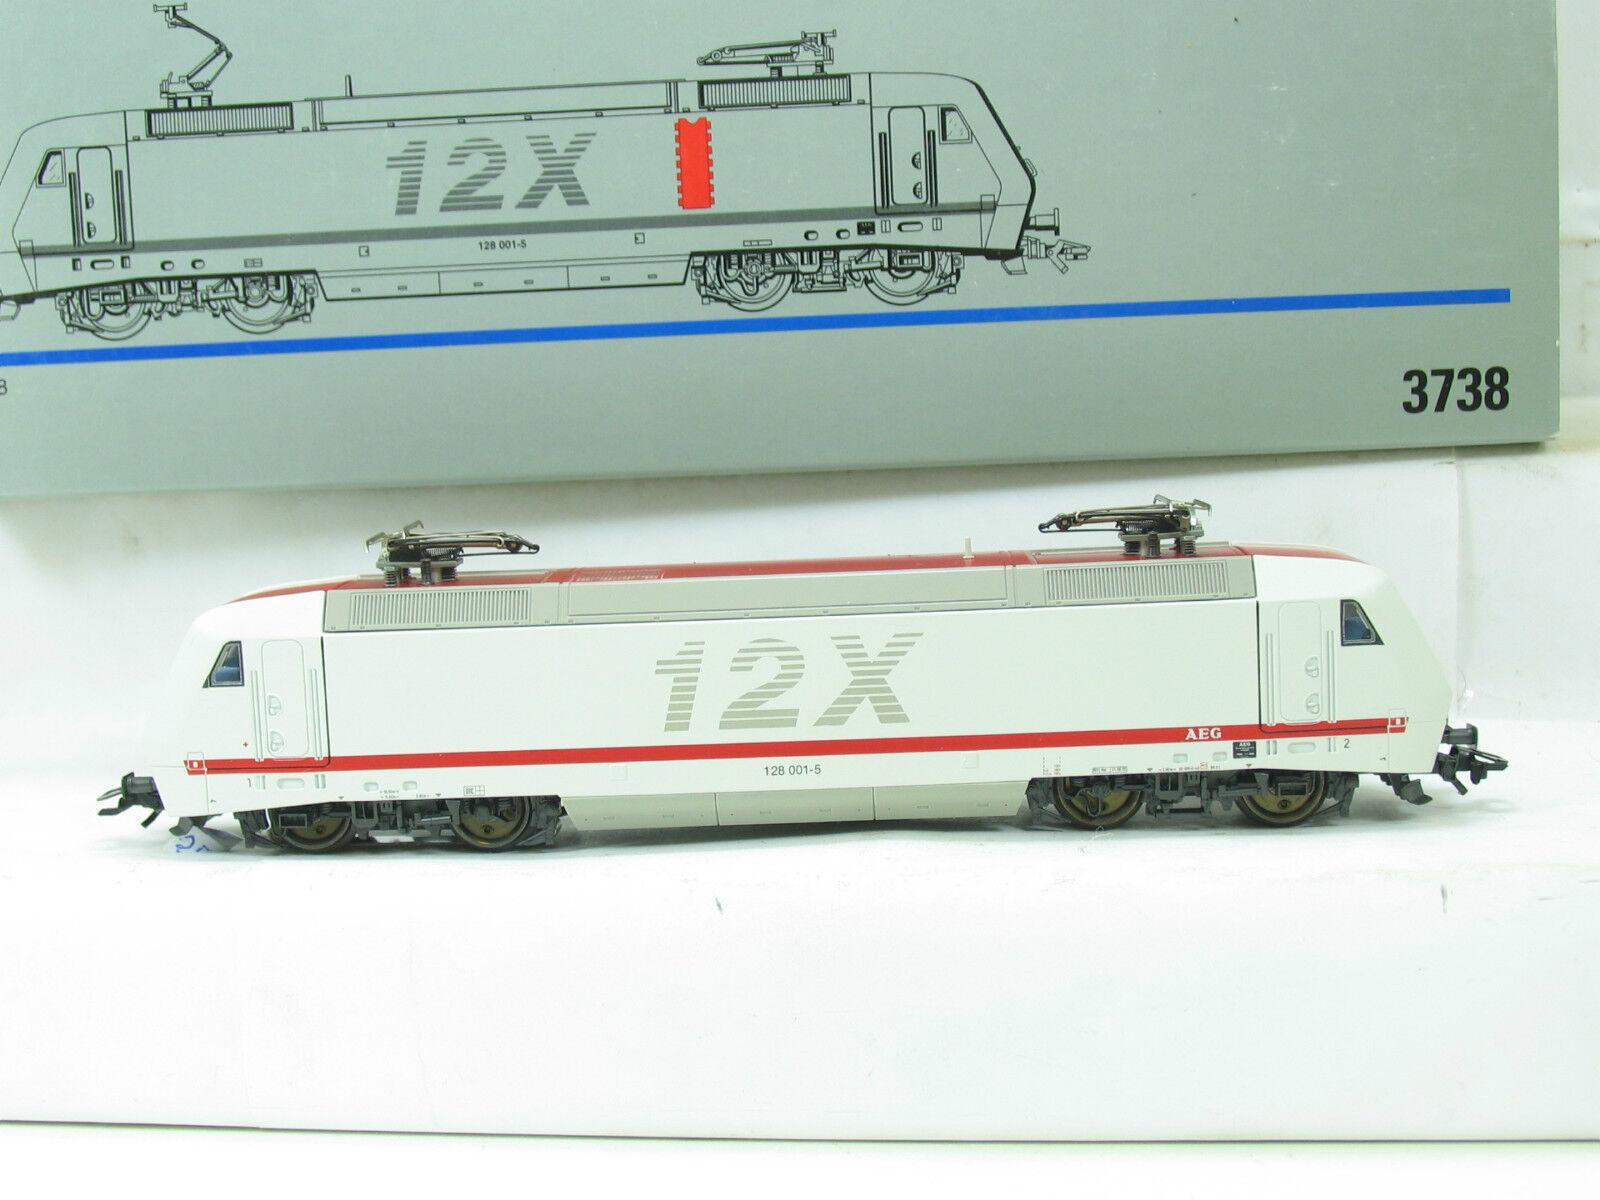 h0 3738 E-Lok BR 128 001-5 Digital AEG 12x b2137